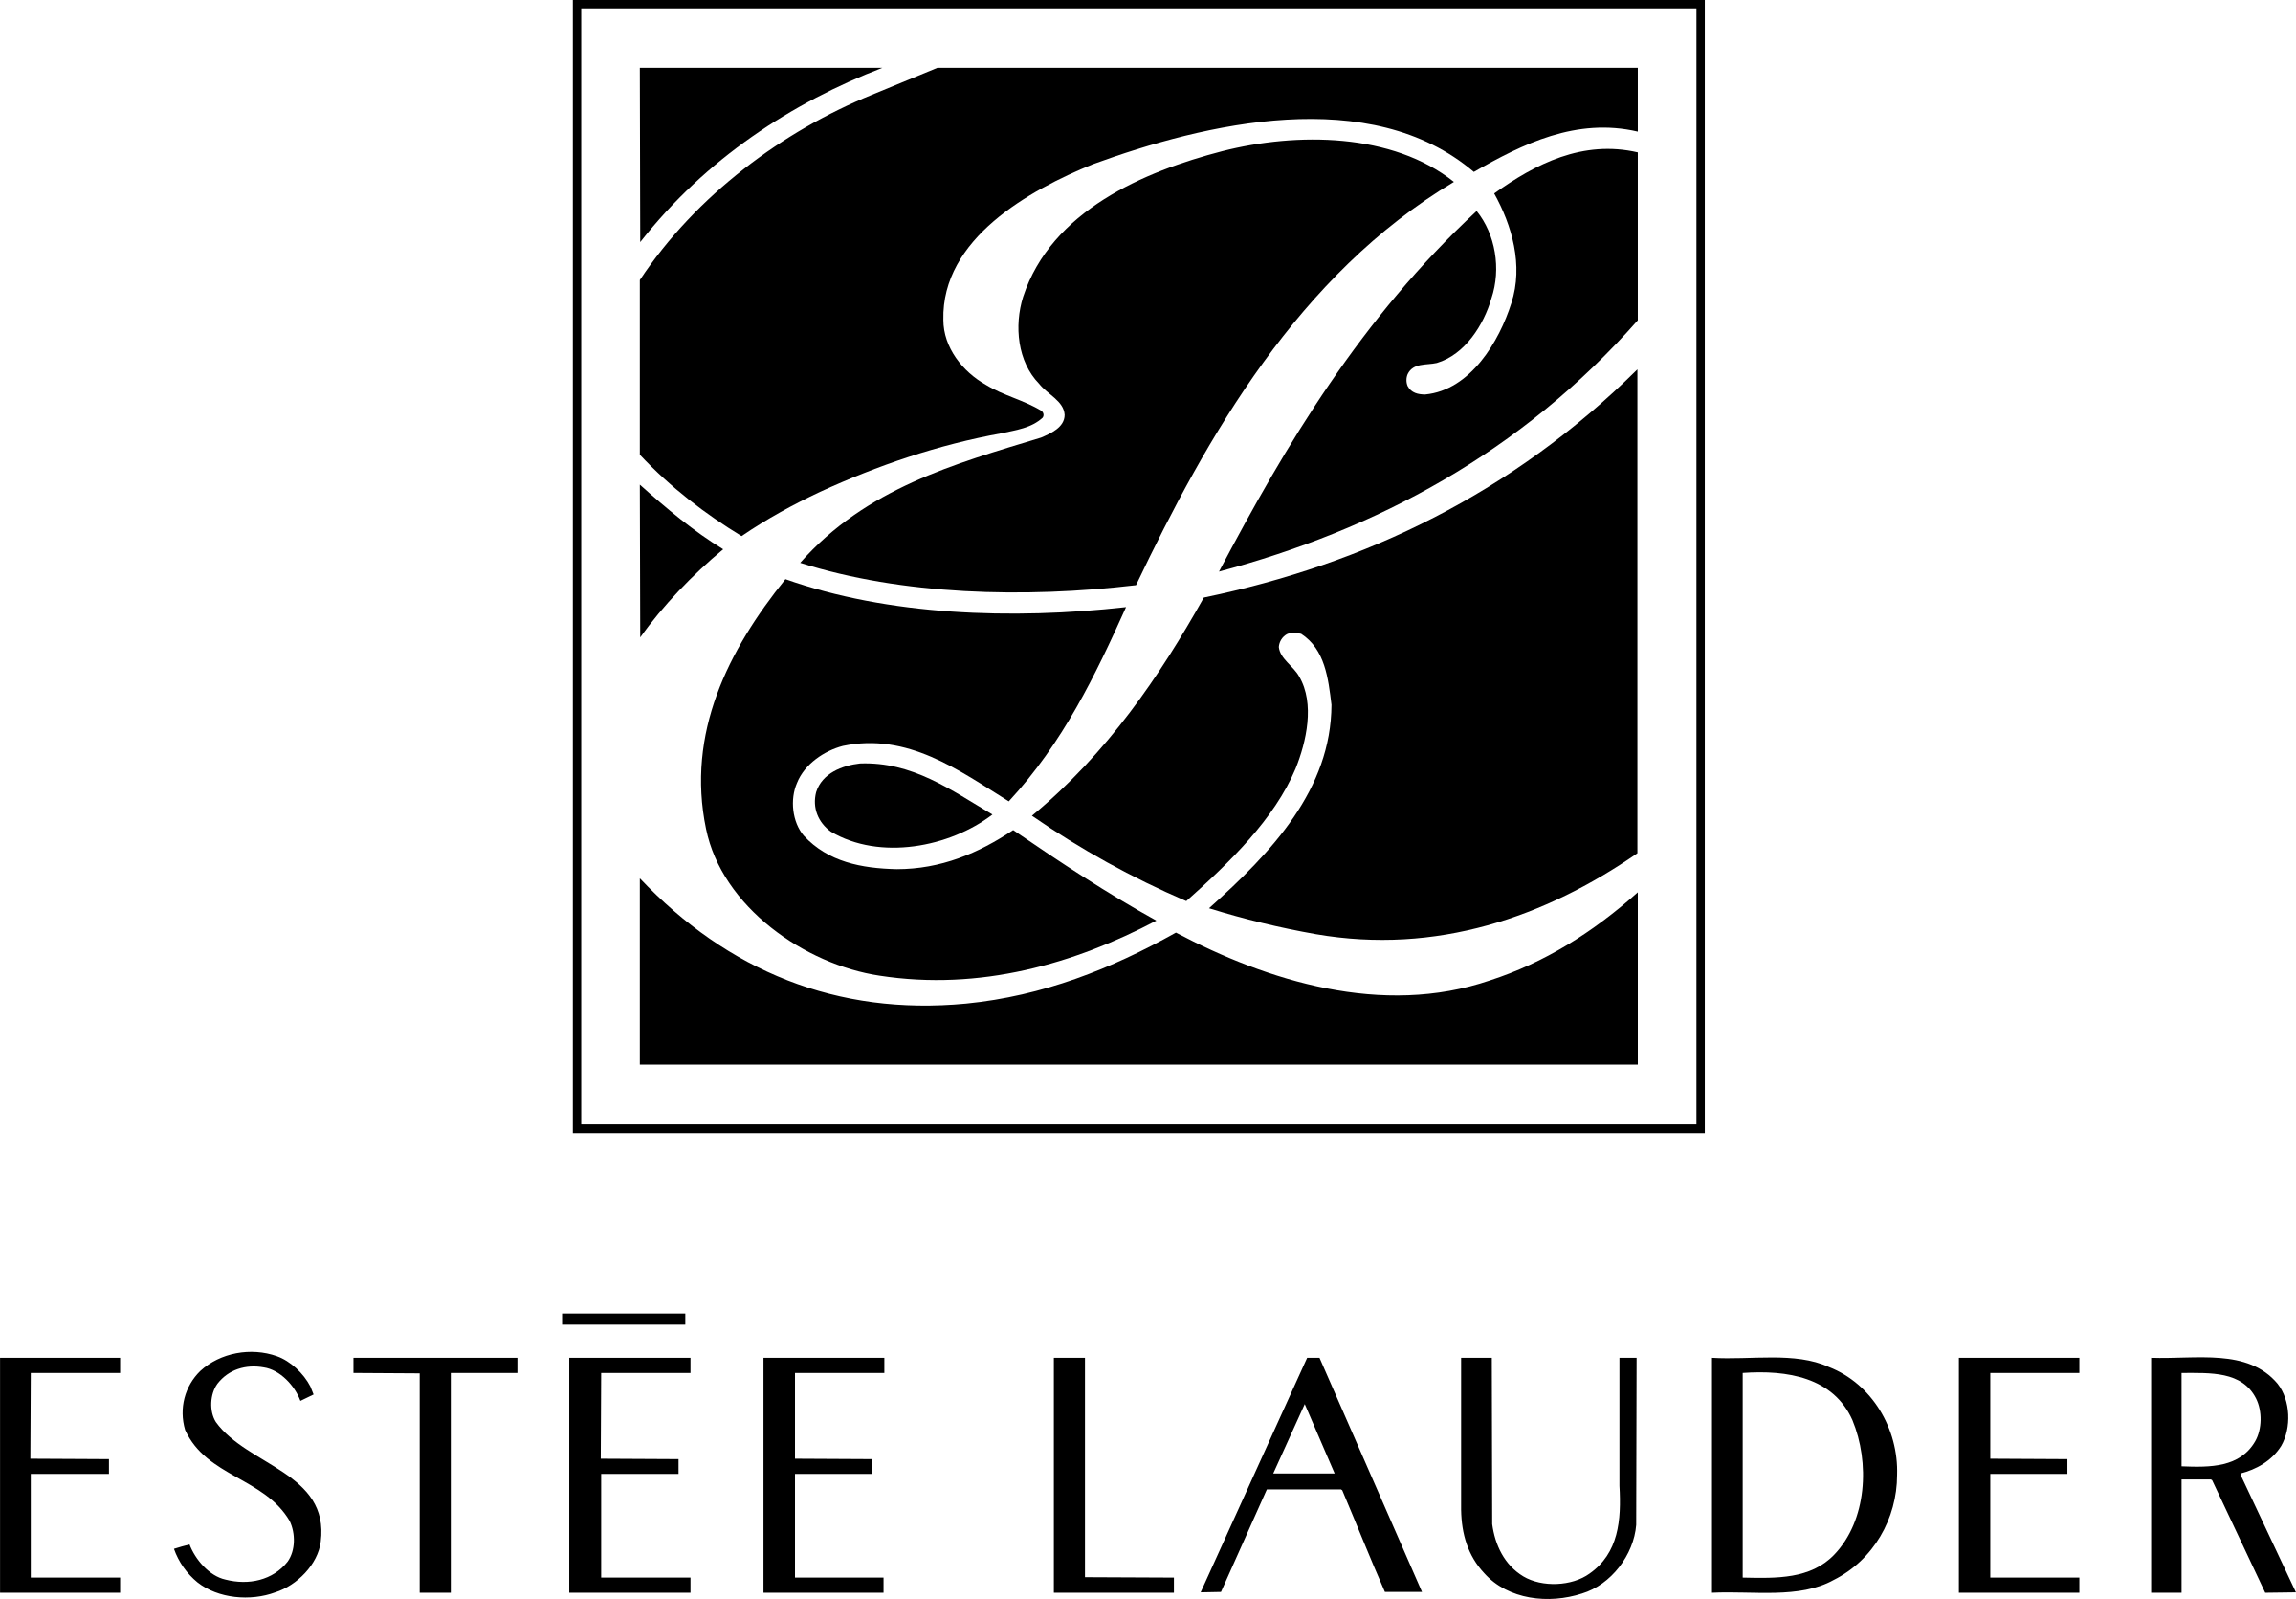 ESTEE LAUDER 2 Logo PNG Transparent & SVG Vector.